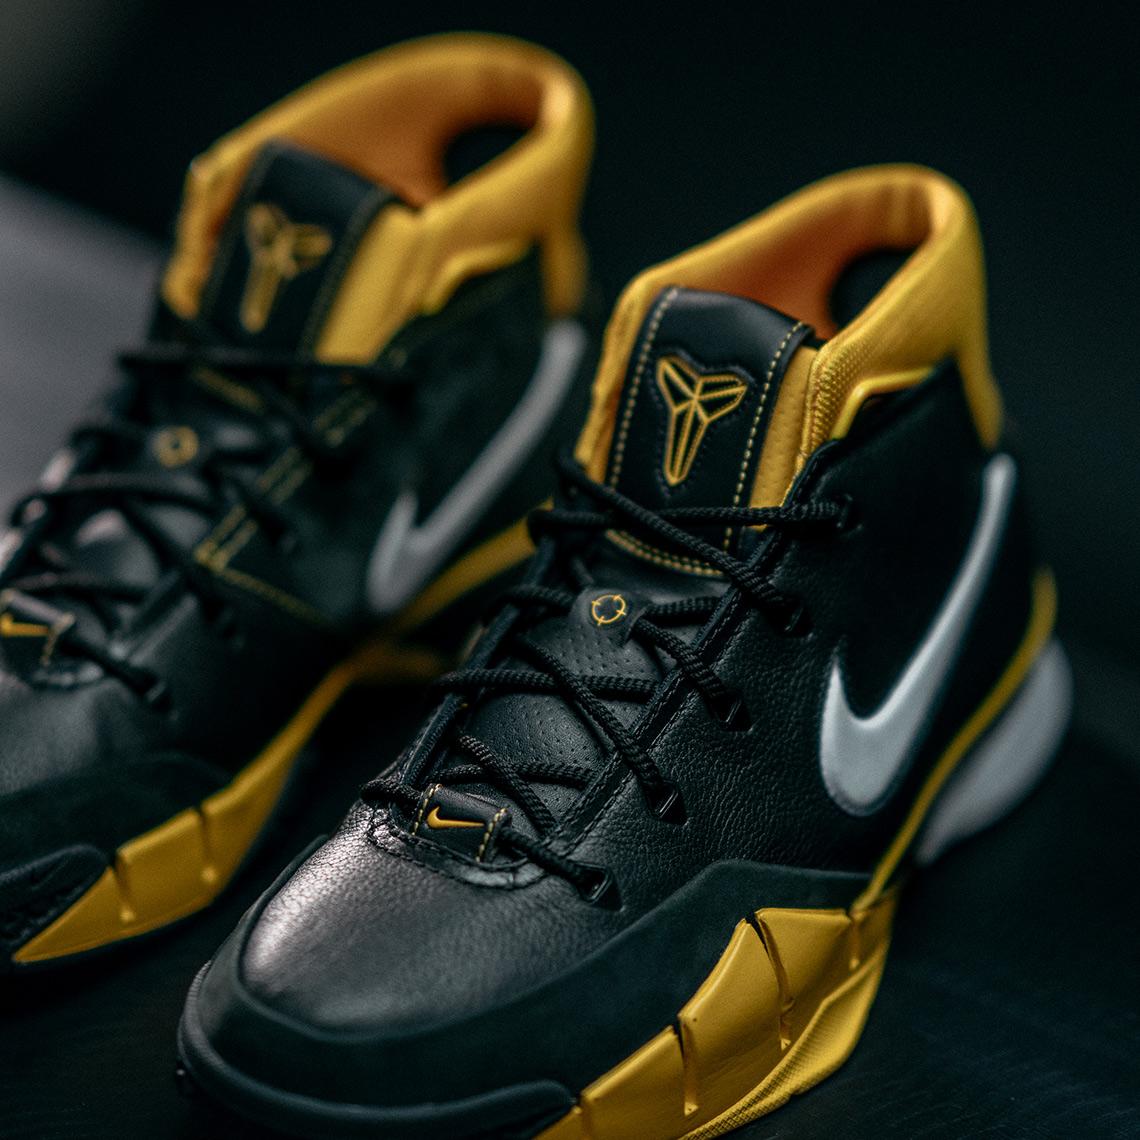 cb3c1601e3d Nike Zoom Kobe 1 Protro Release Date  February 17th